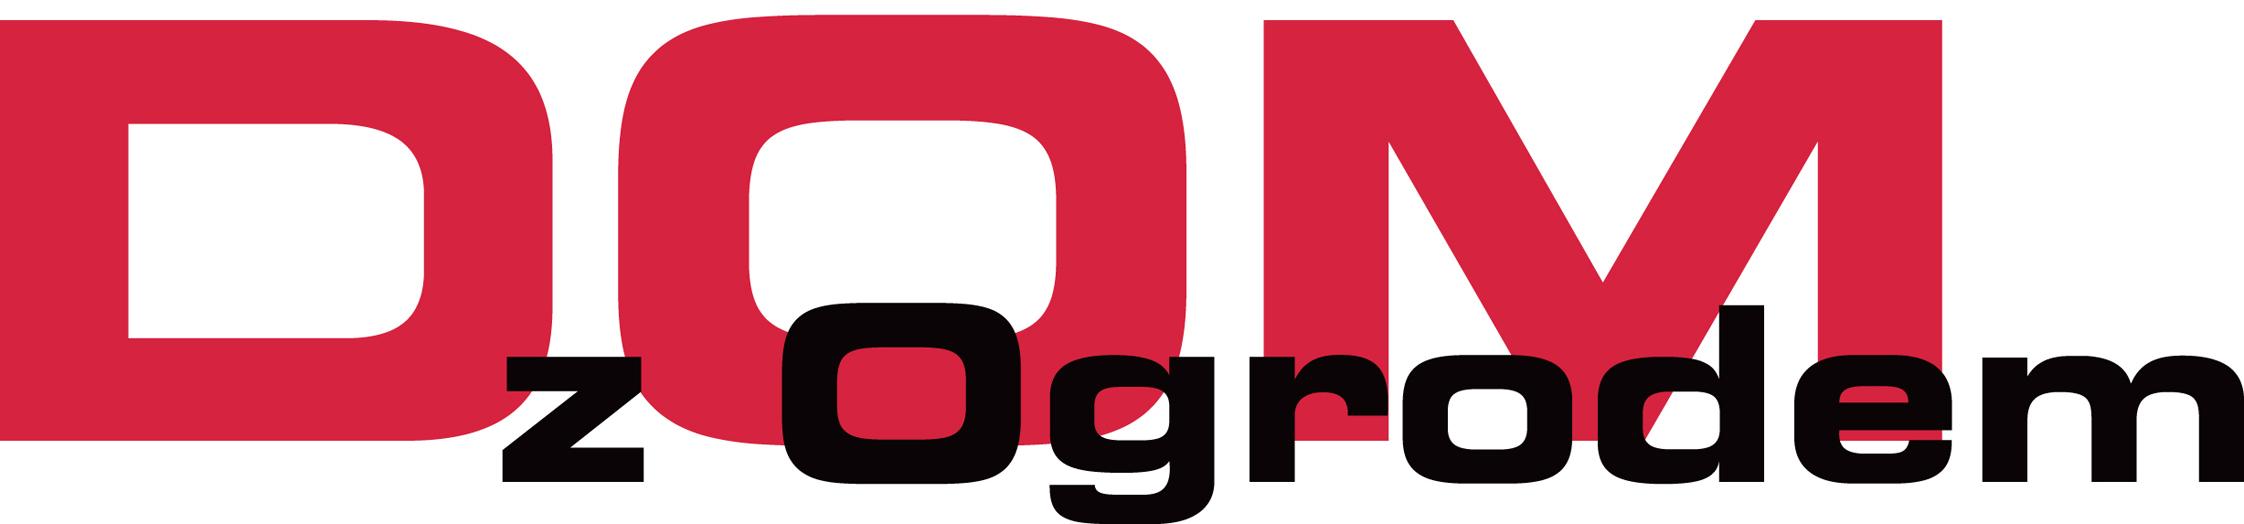 DzO_logo